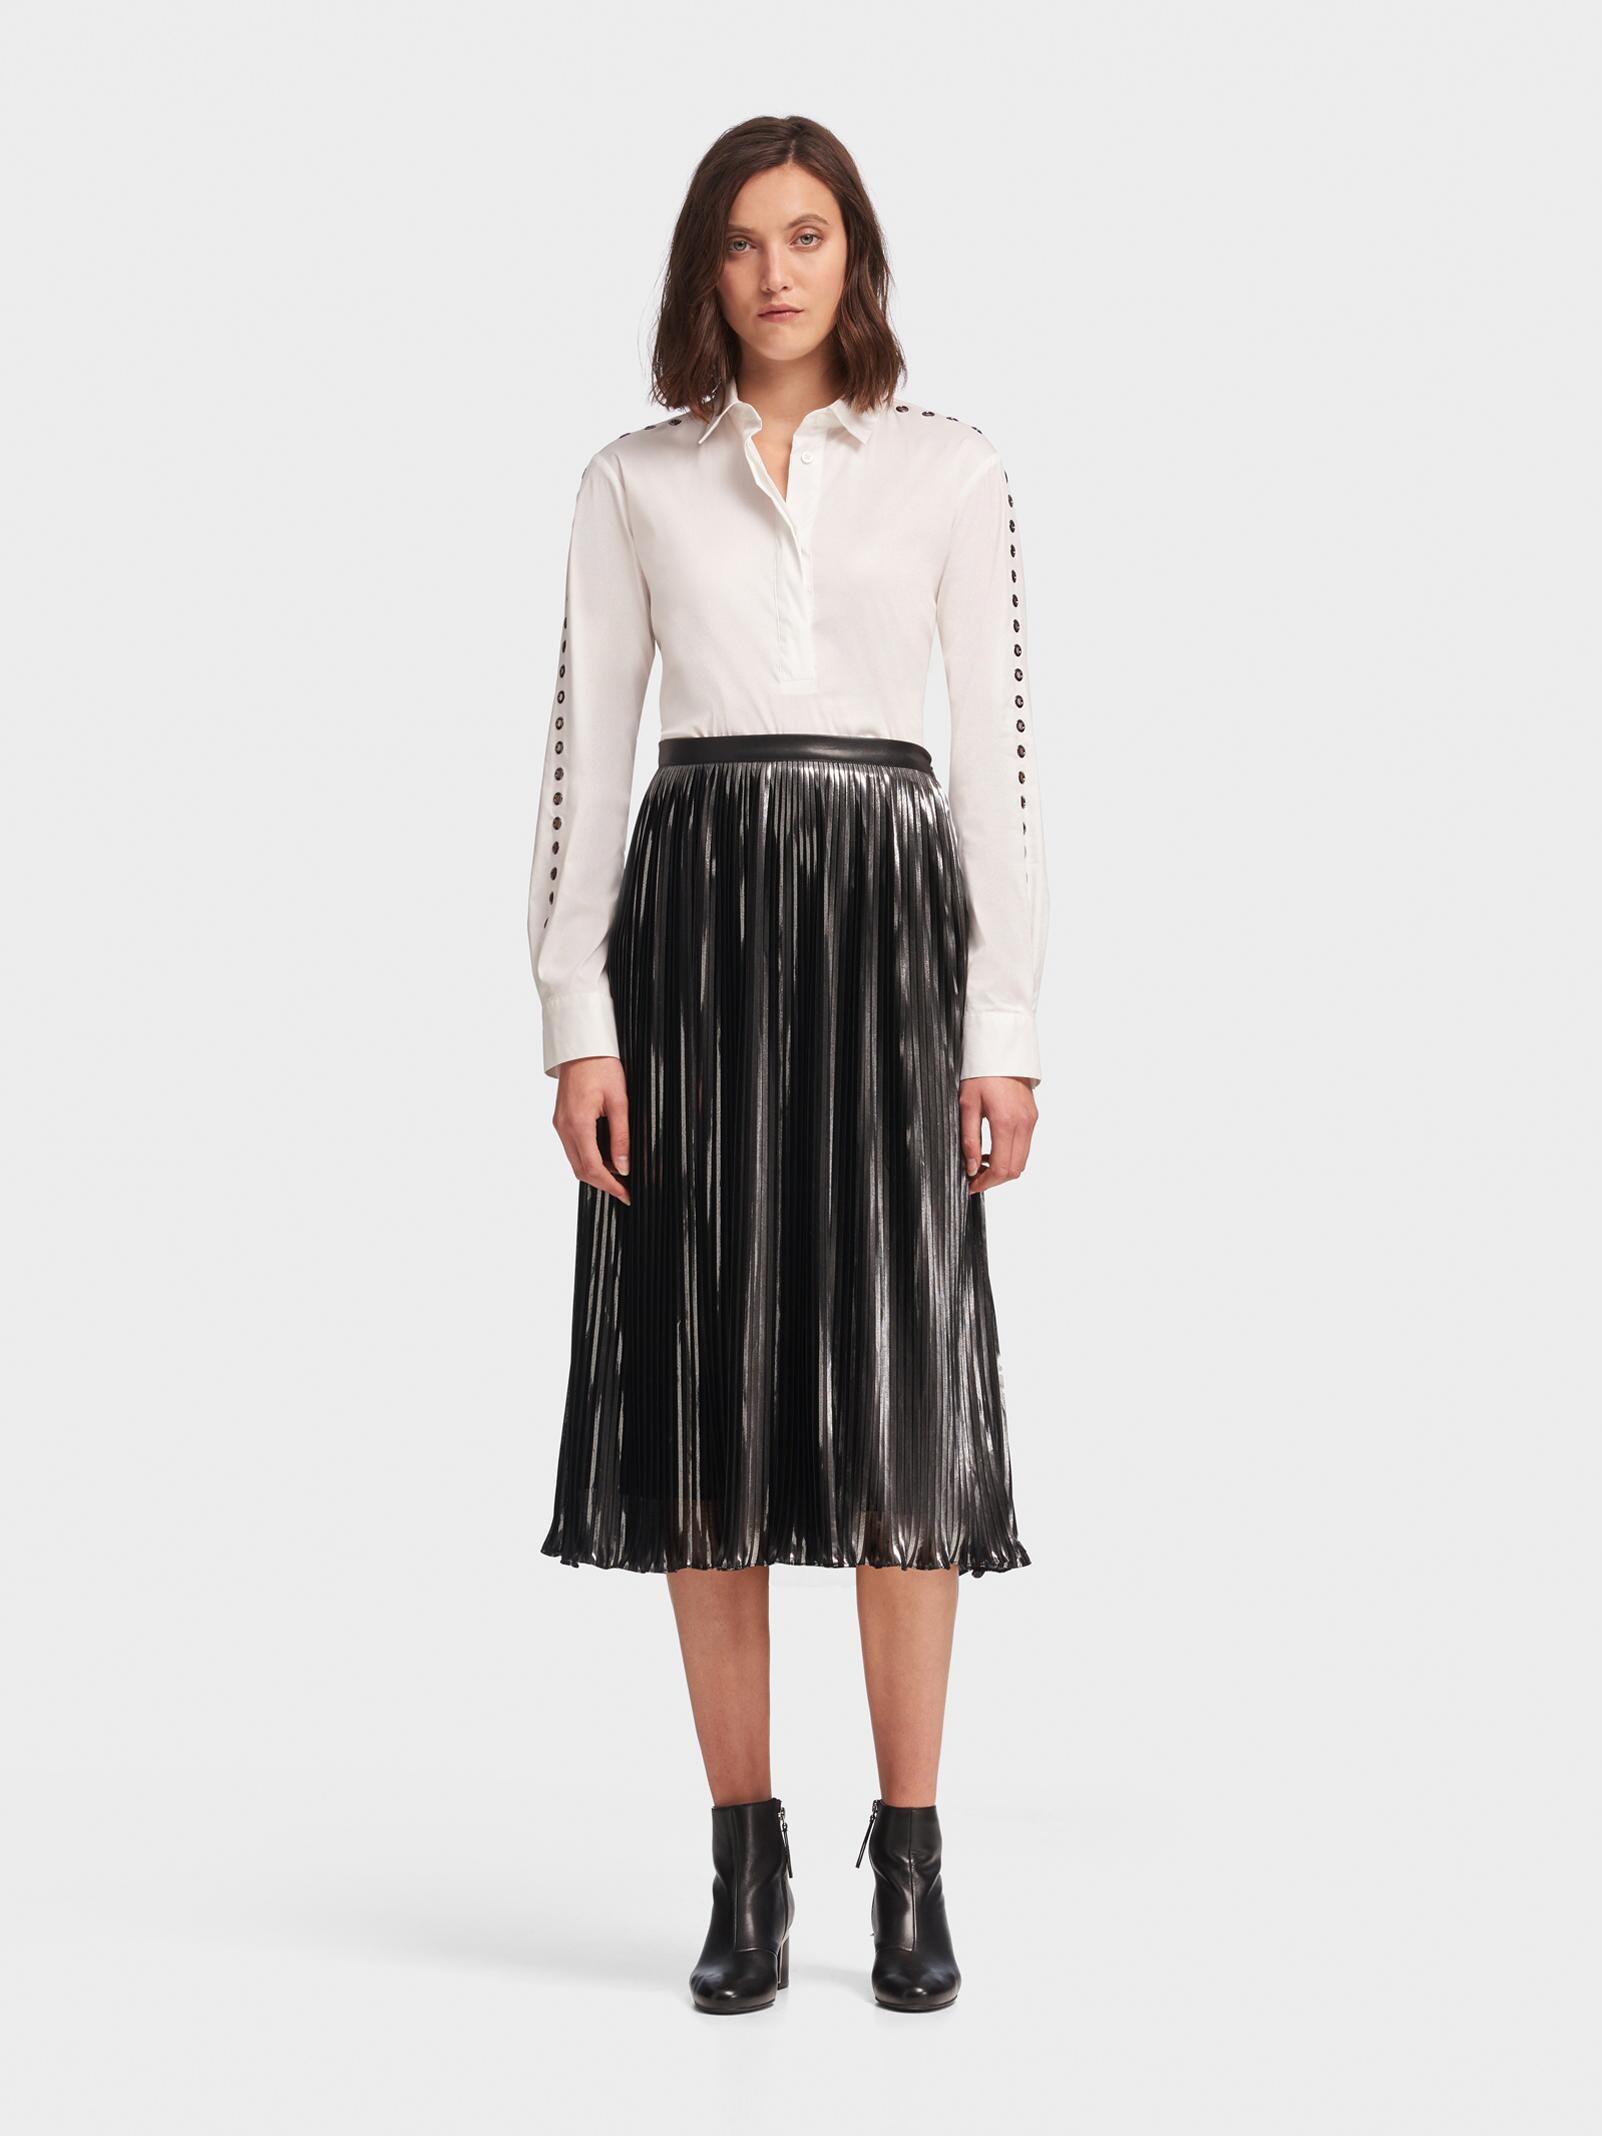 139f66e9e0 DKNY Pleated Metallic Midi Skirt in Black - Lyst